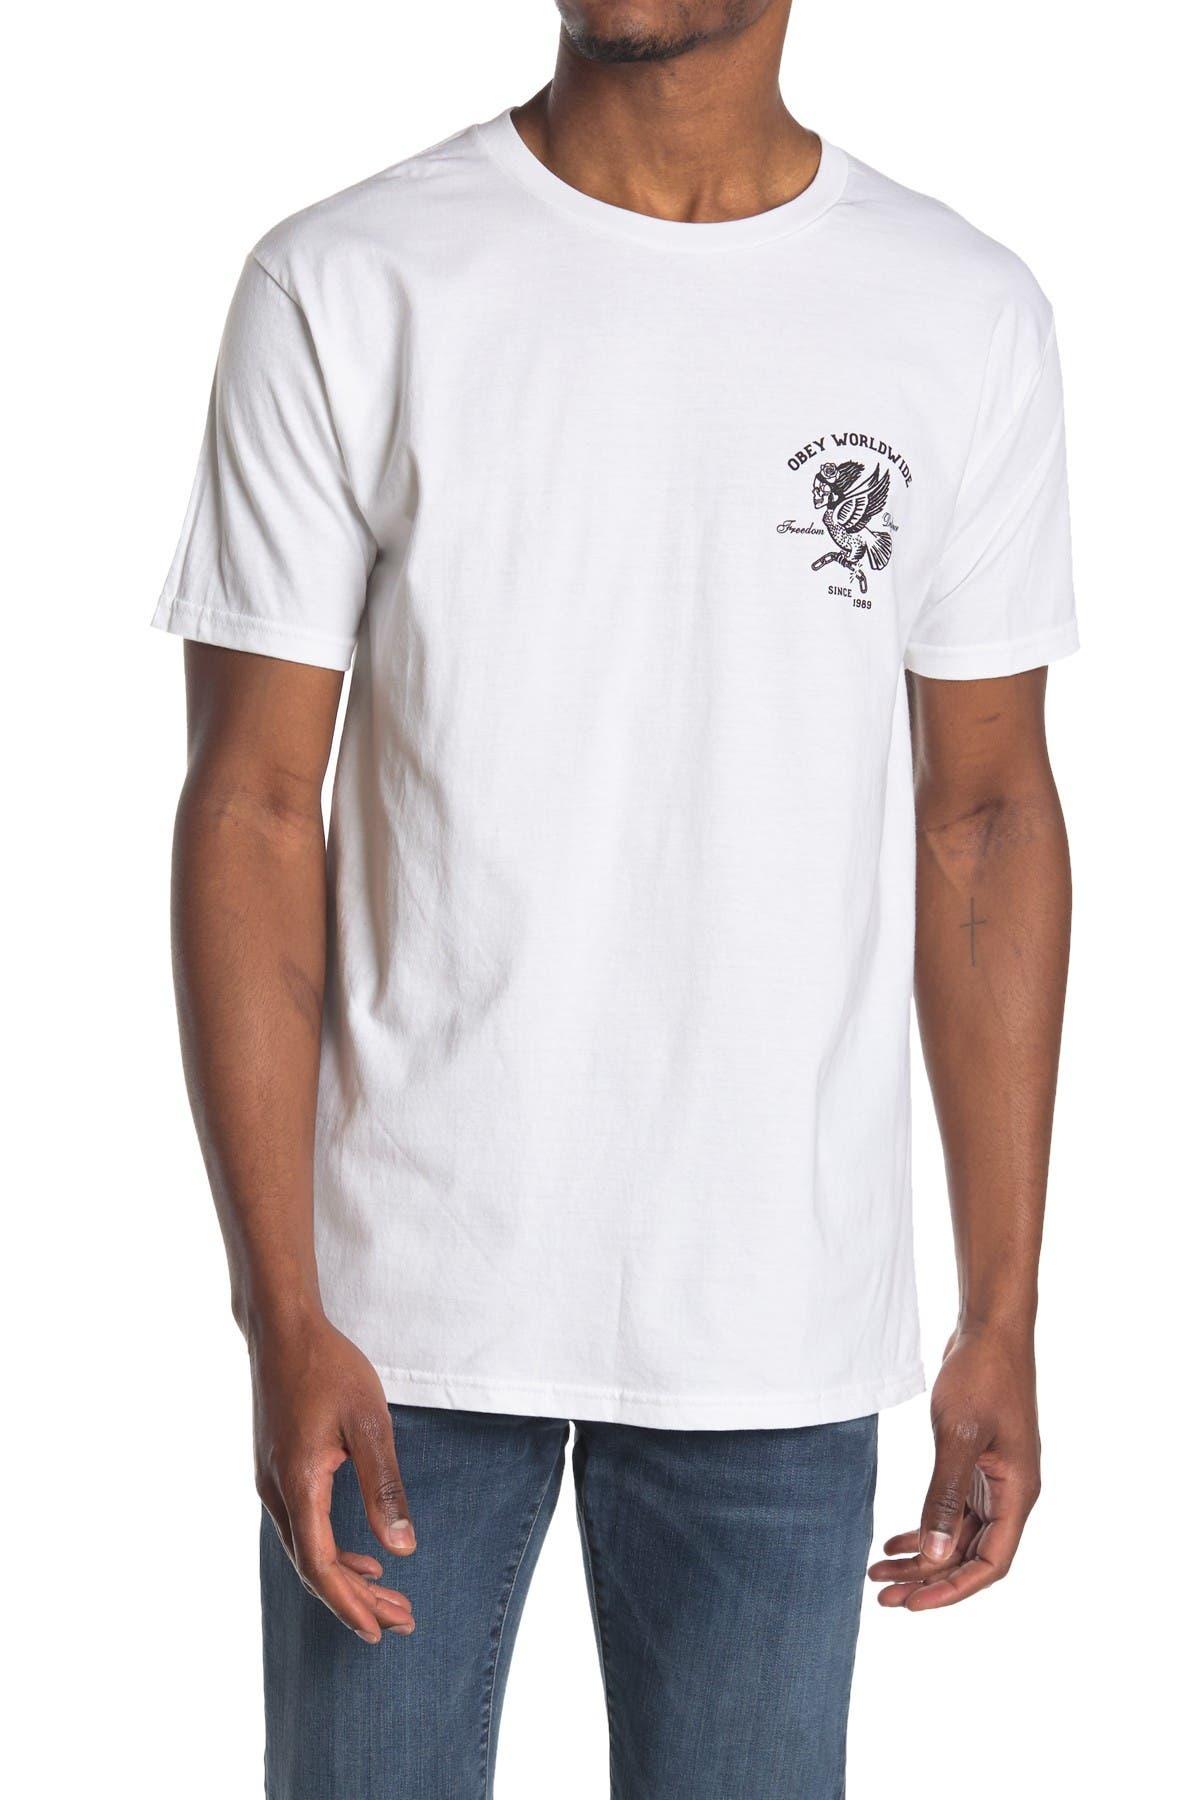 Image of Obey Demon Bird T-Shirt